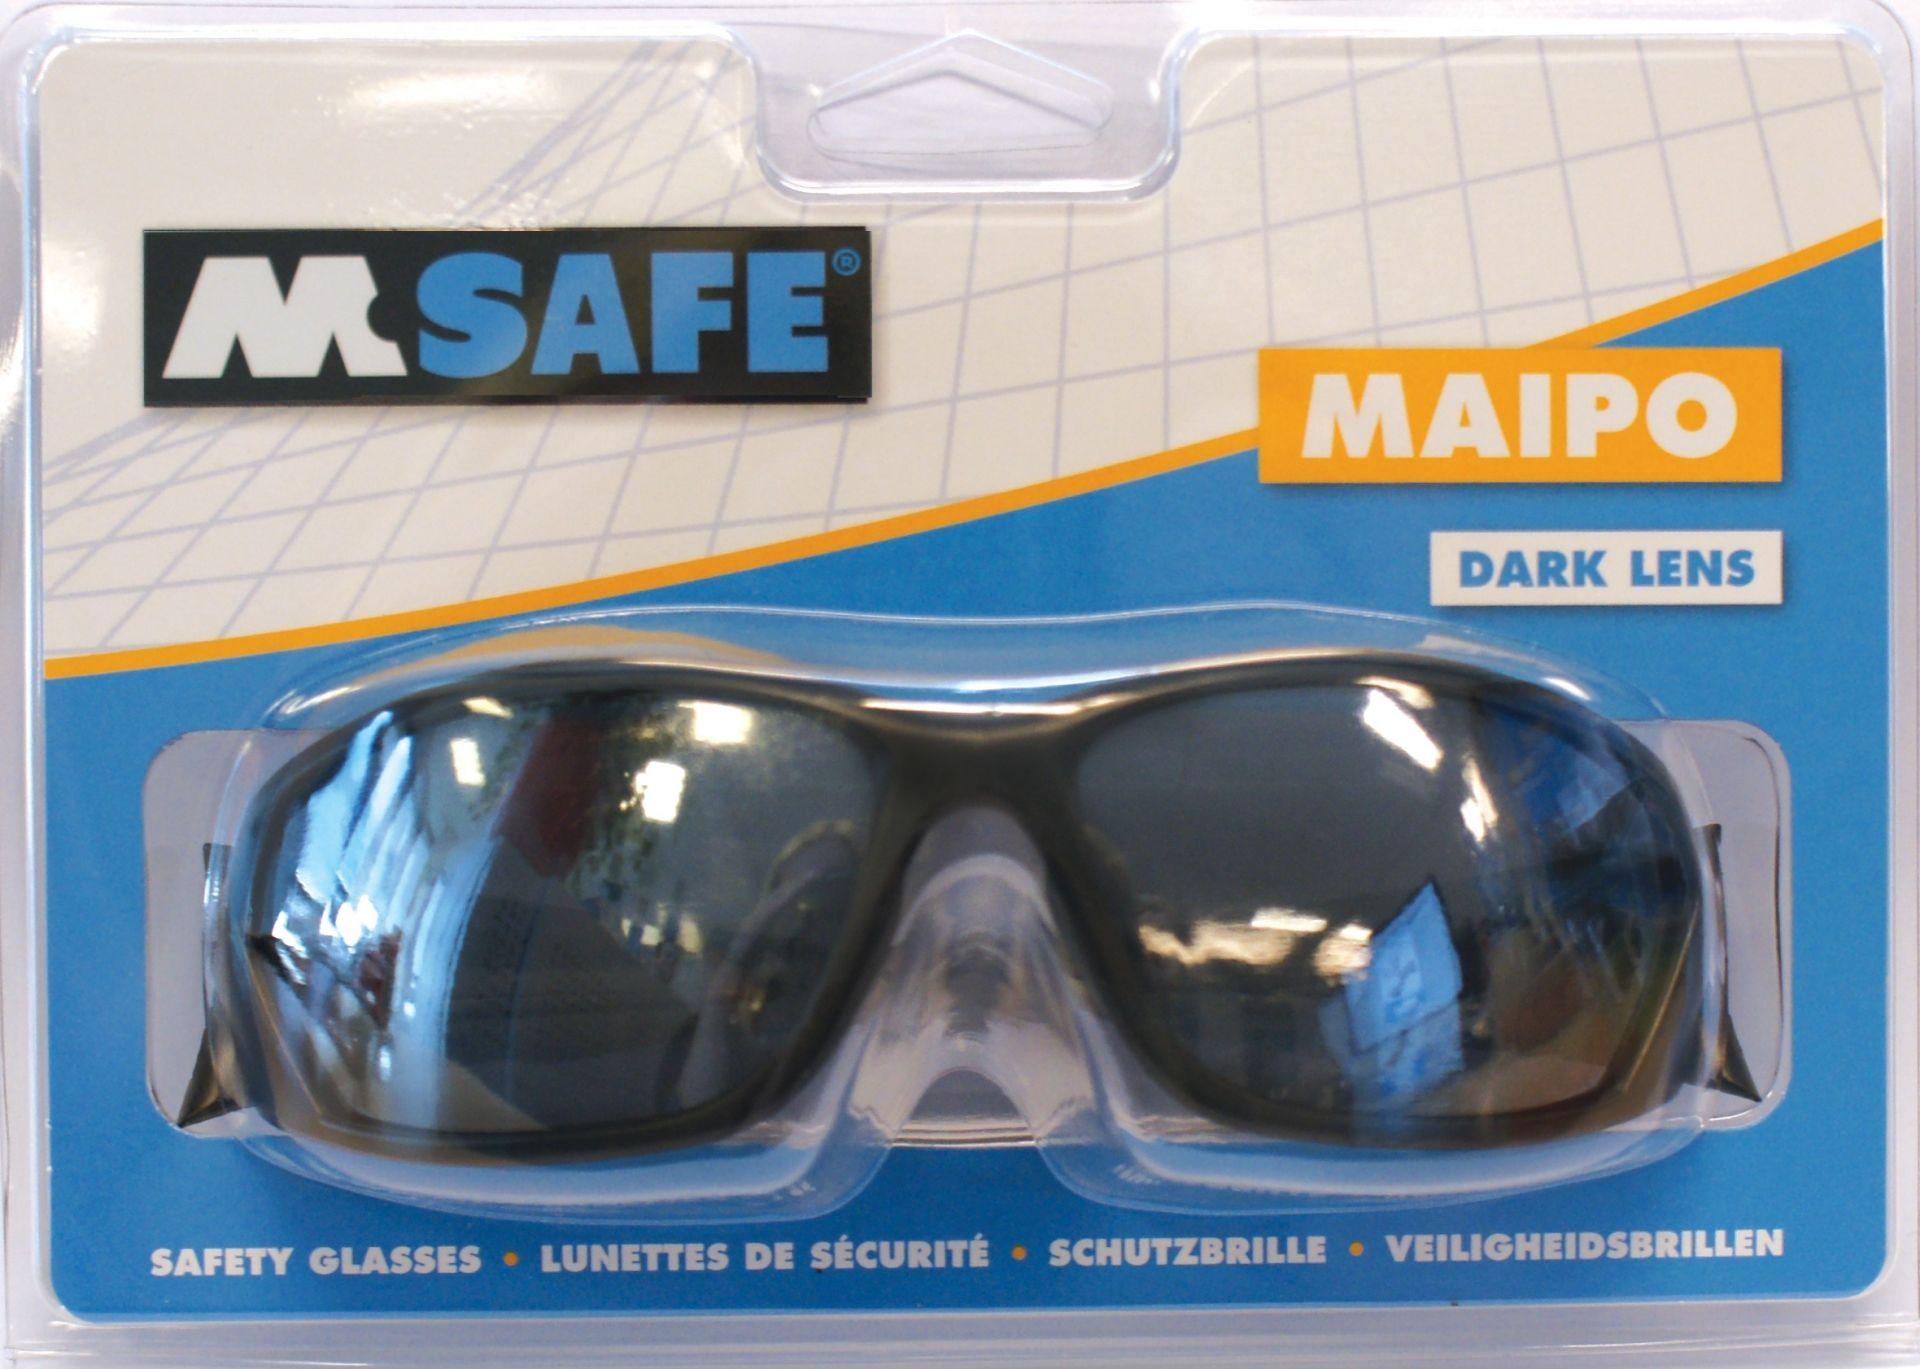 81fc13ec686984 M-Safe v-bril Maipo donkere lens blister - Safety Nation B.V.